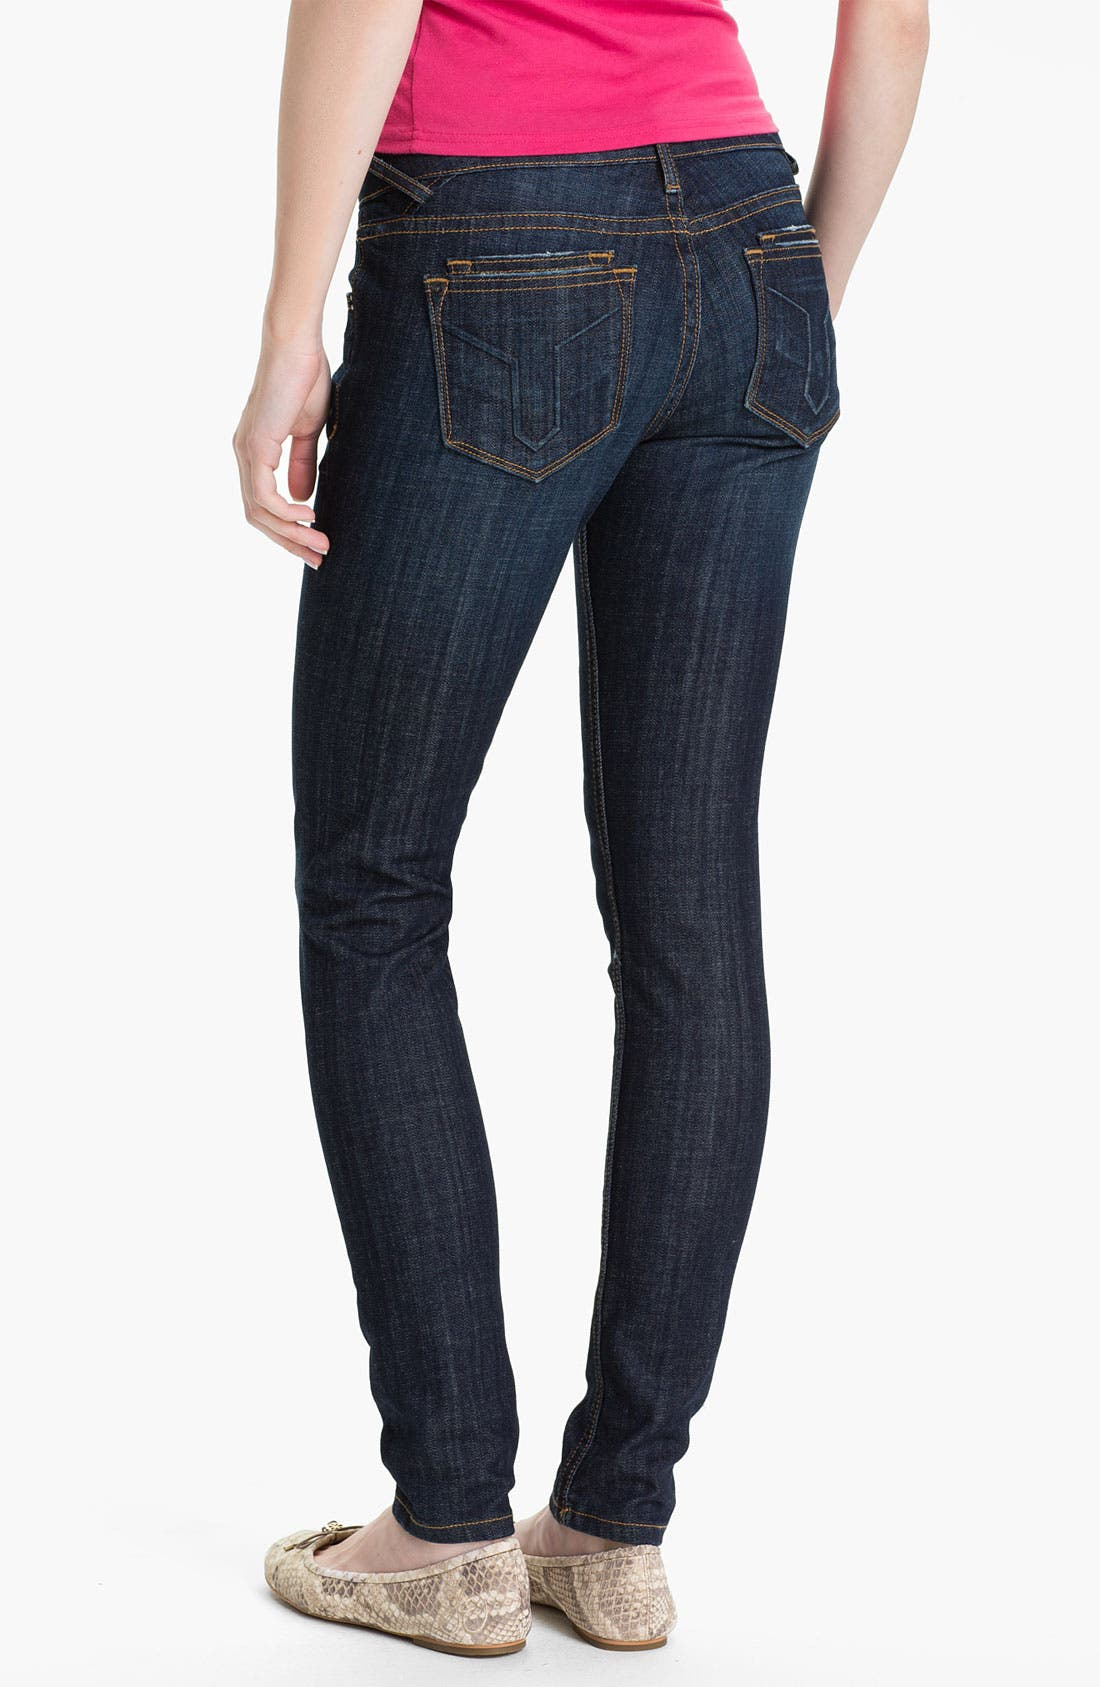 Alternate Image 1 Selected - Vigoss 'True' Skinny Stretch Denim Jeans (Juniors)